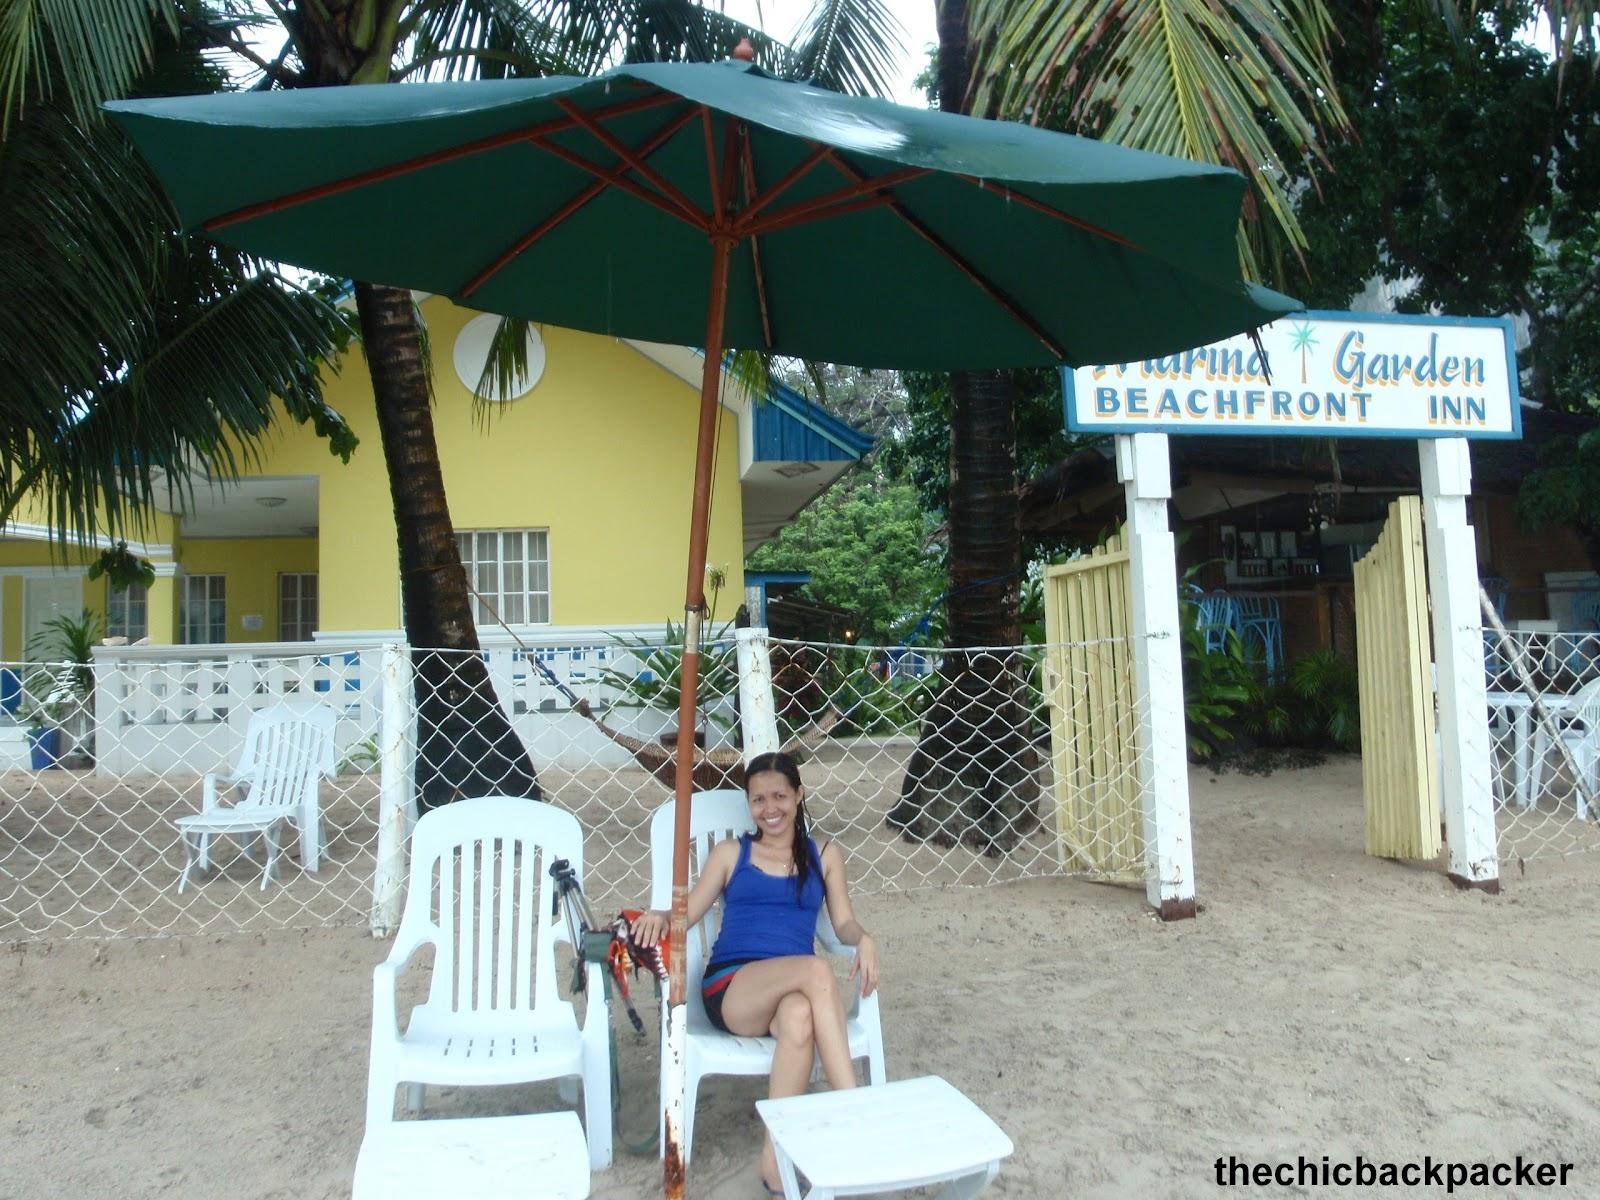 THE CHIC BACKPACKER: Marina Garden Beachfront Inn, El Nido, Palawan